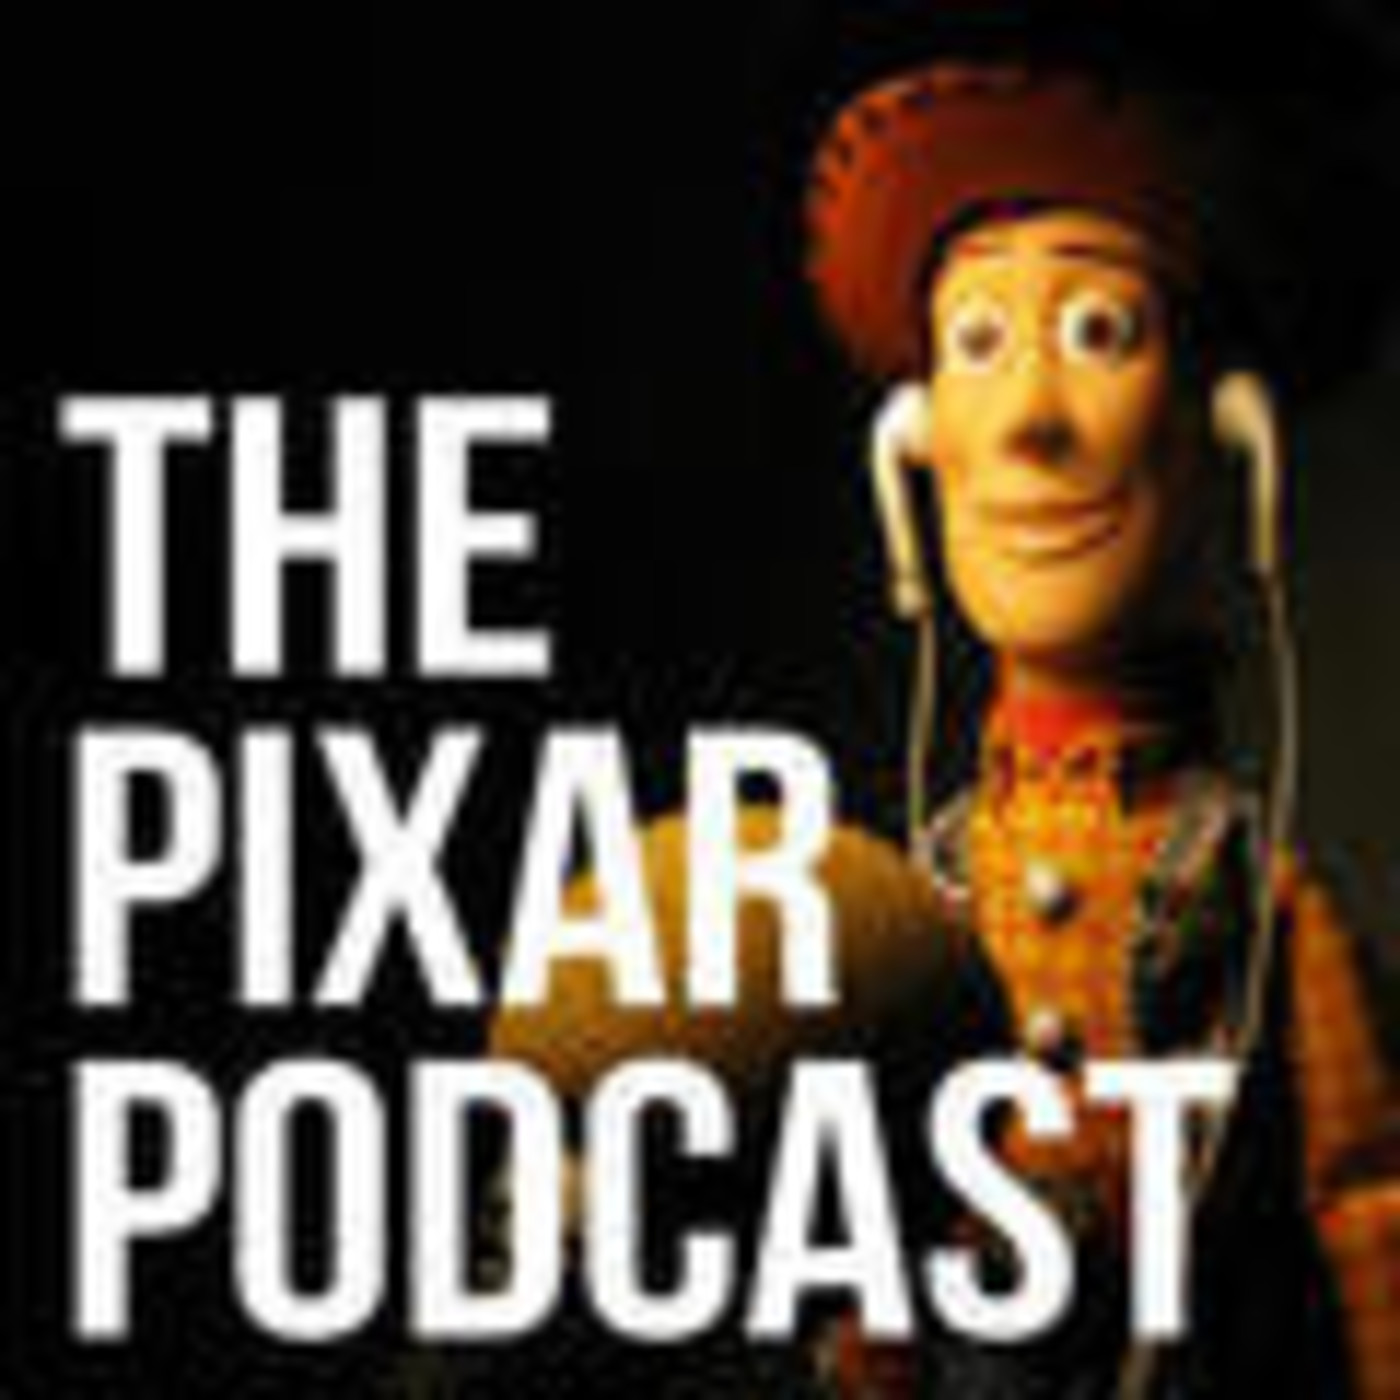 The Pixar Podcast